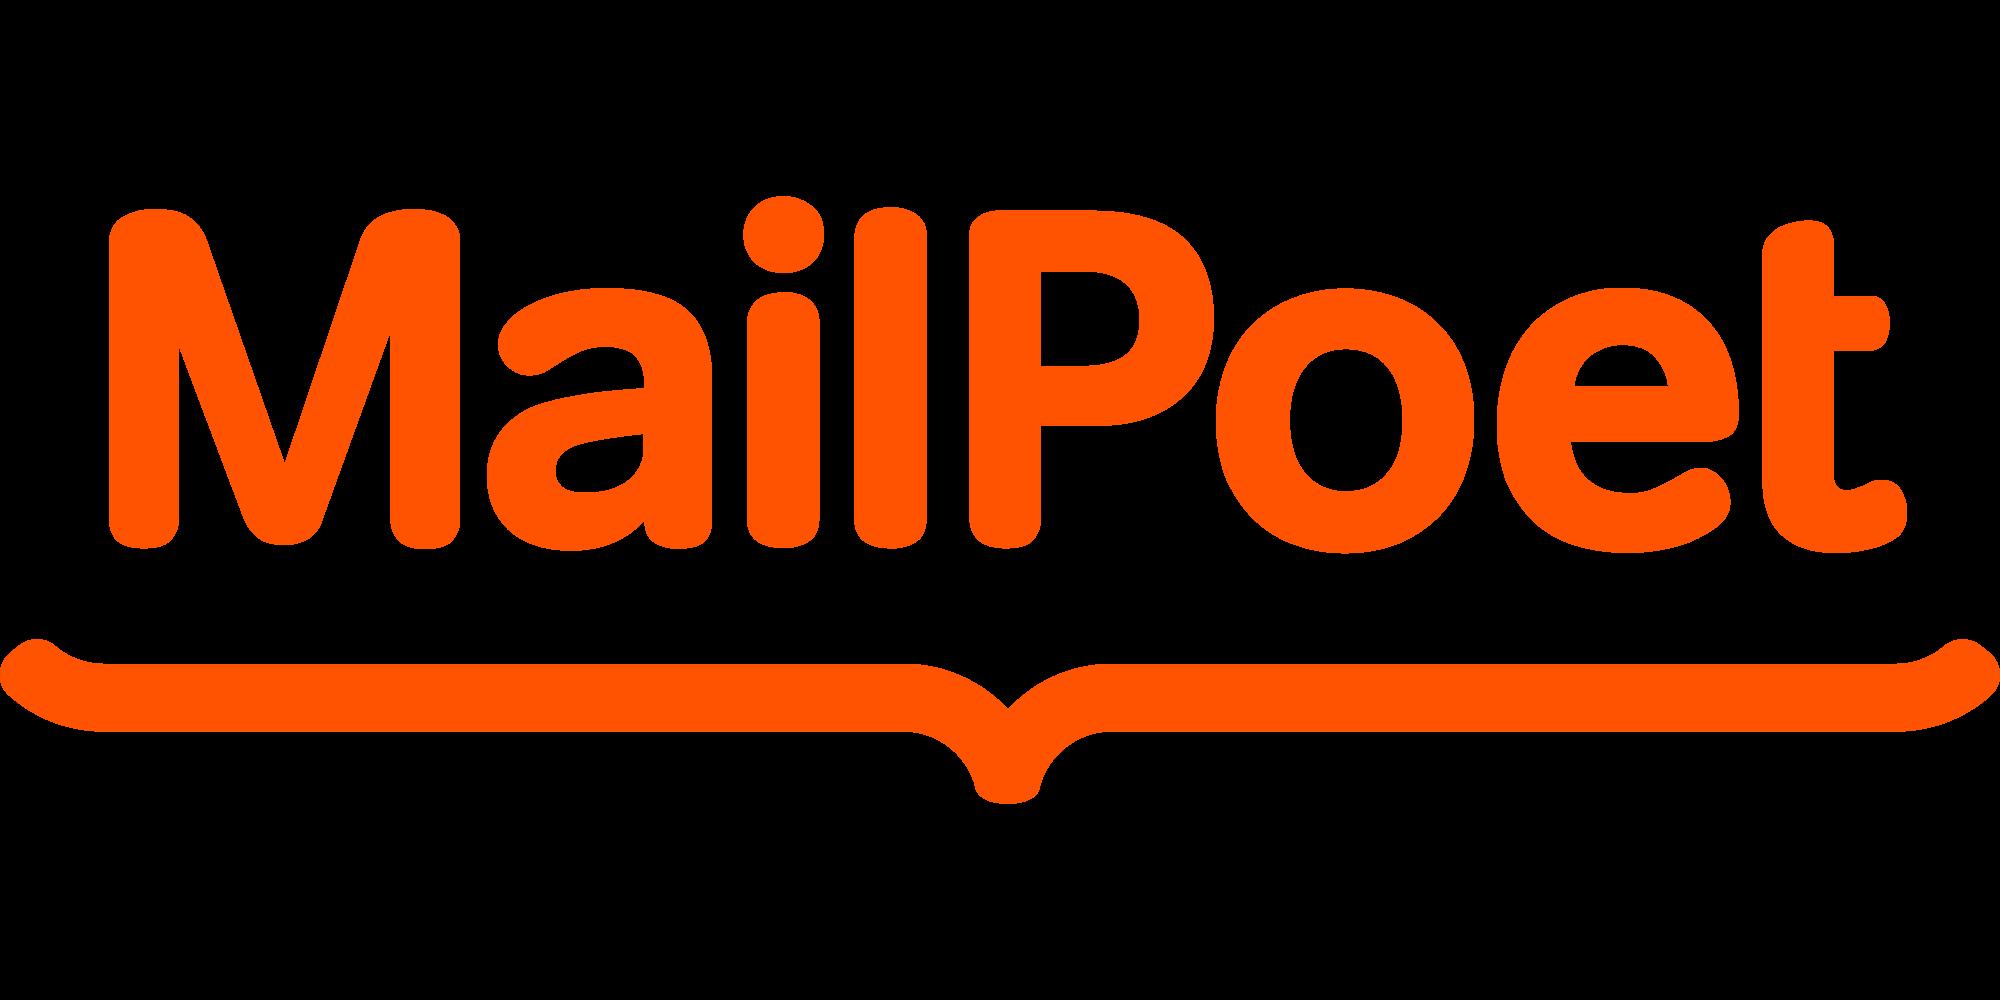 Mail Poet logo